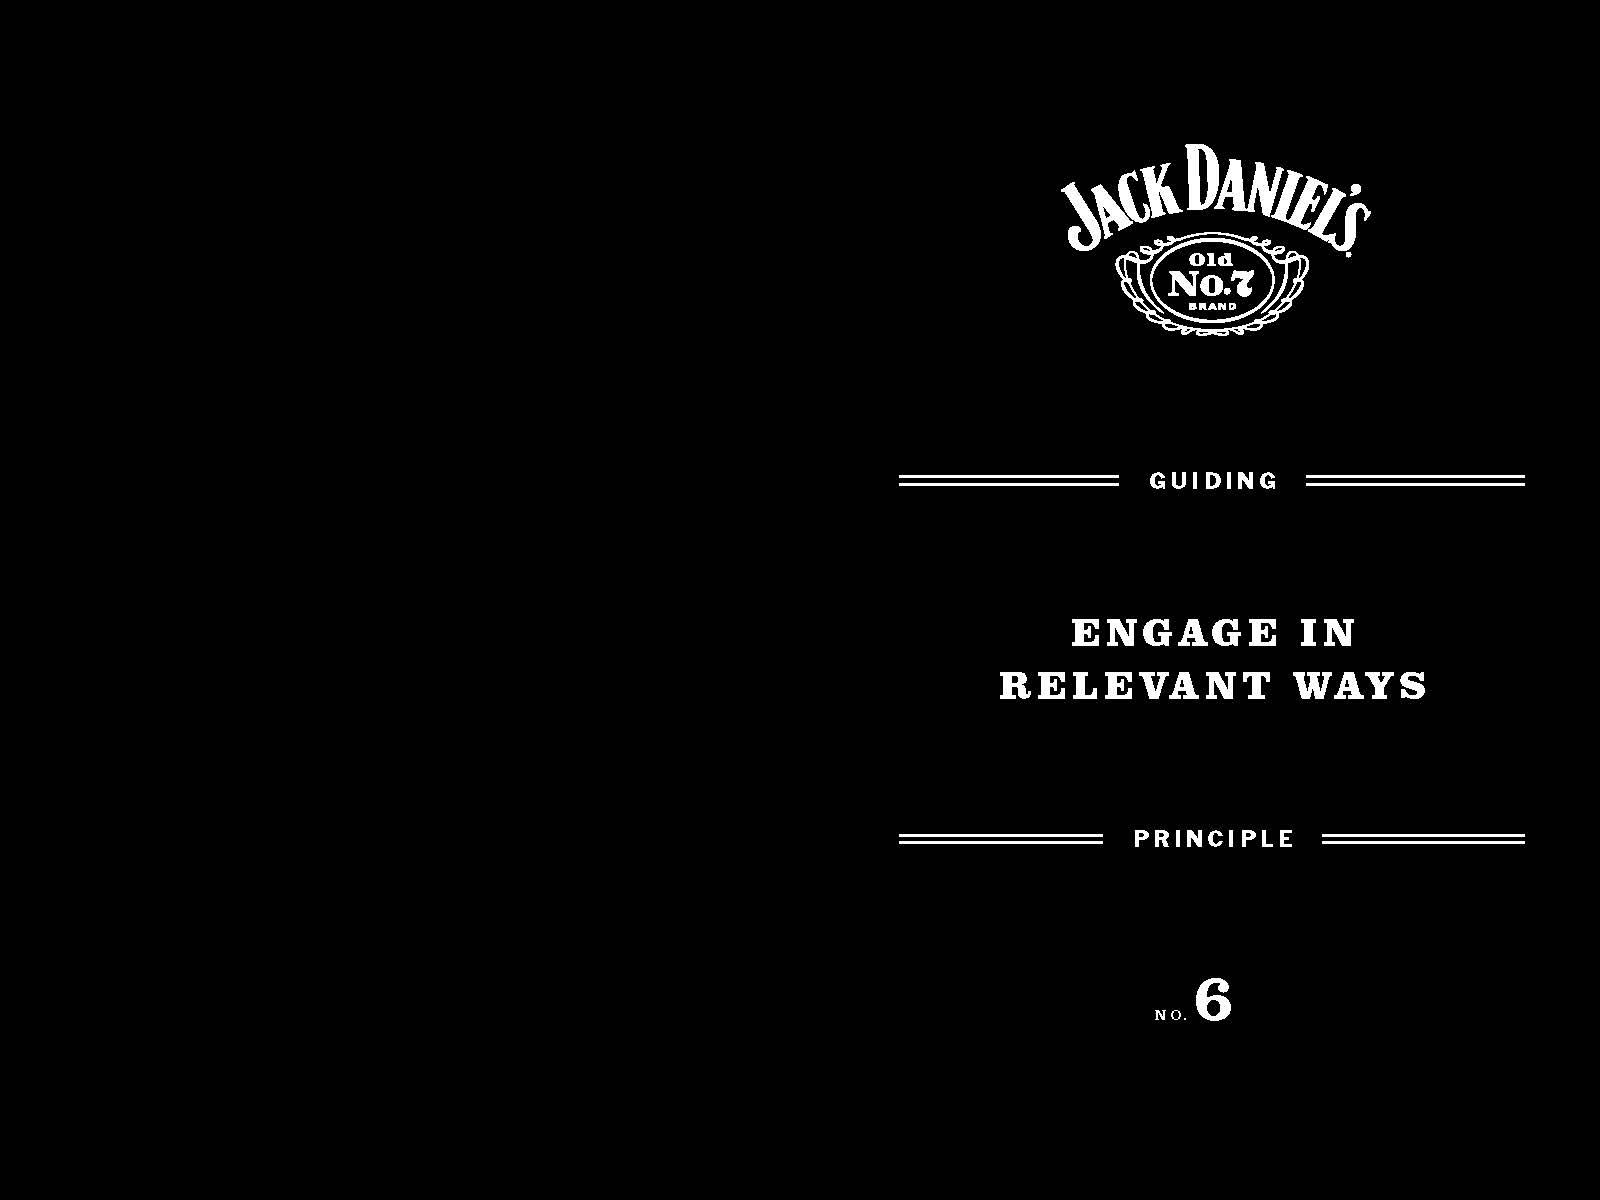 Jack Daniel's Guiding Principles 2012_Page_49.jpg